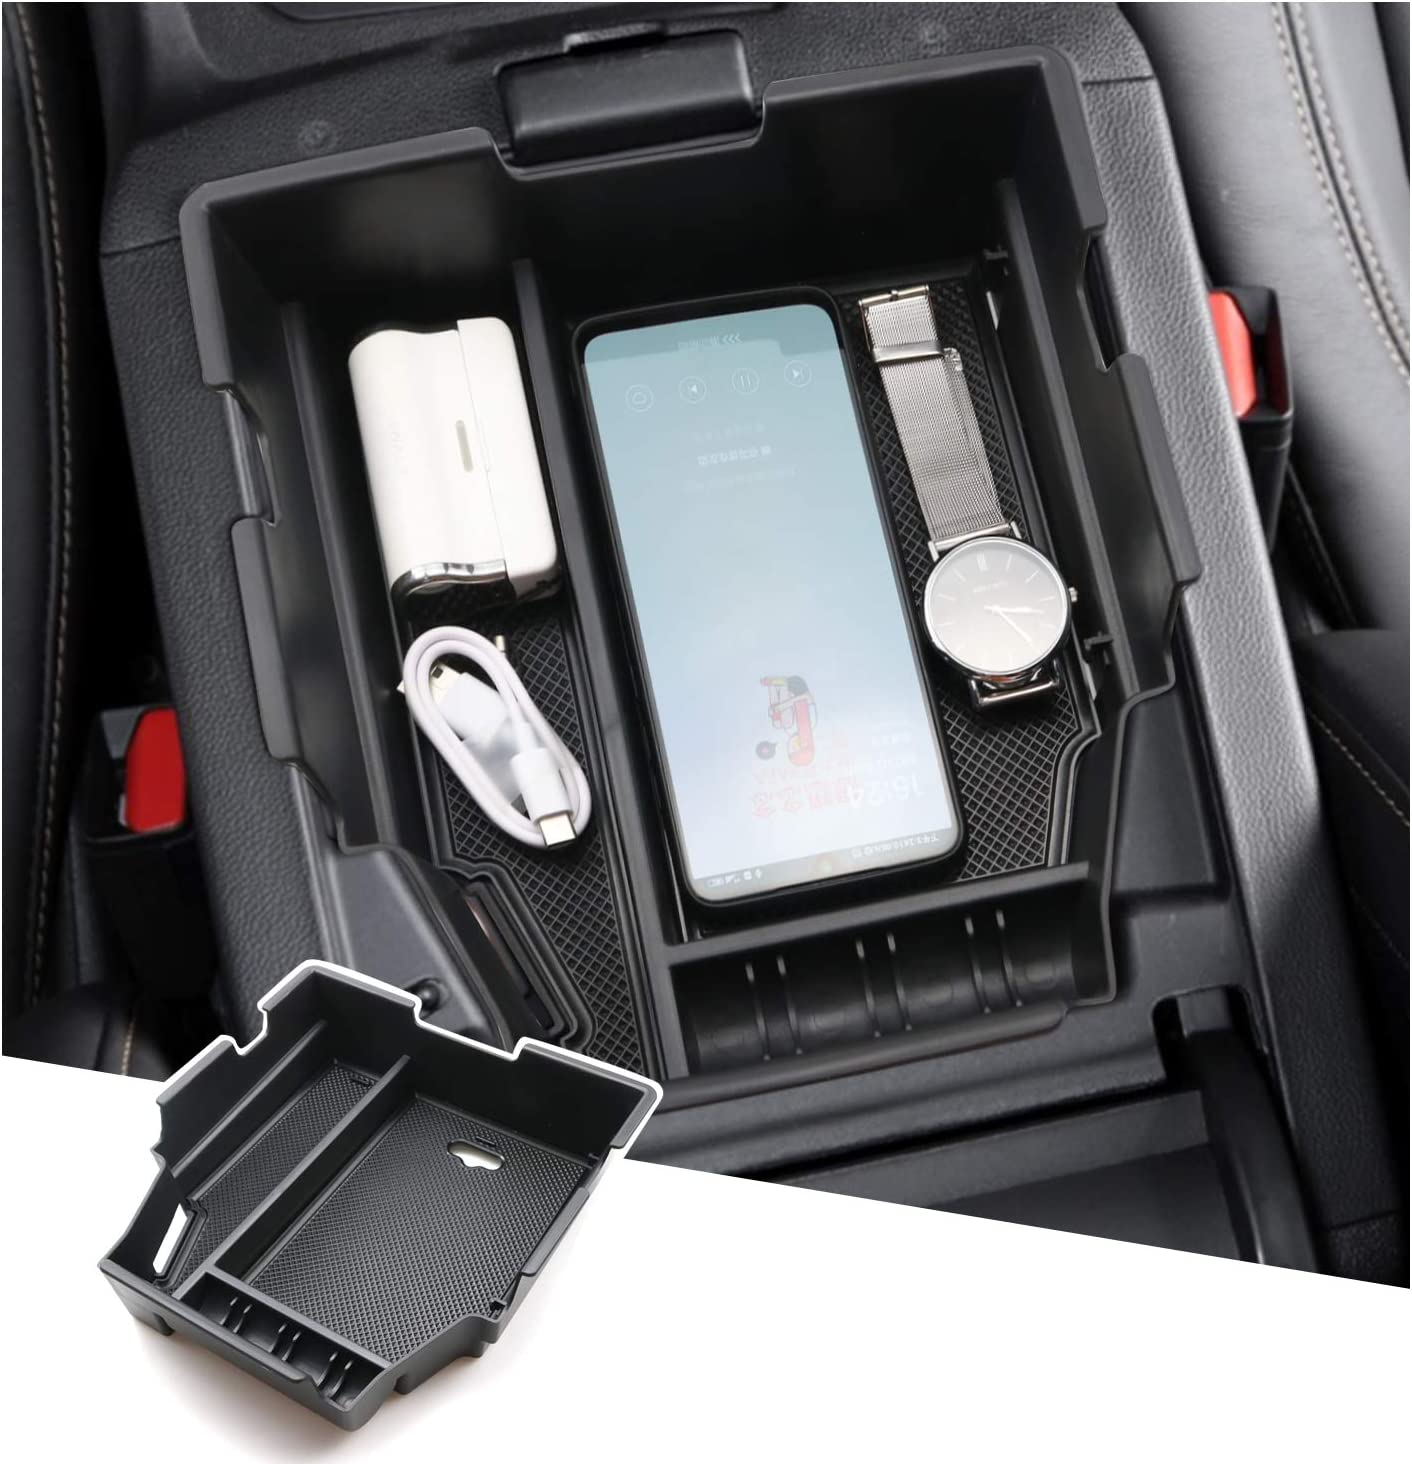 SHAOHAO Interior Accessories for Chevrolet Chevy Traverse Armrest Organizer 2019 2020 2021 Traverse Center Console Storage